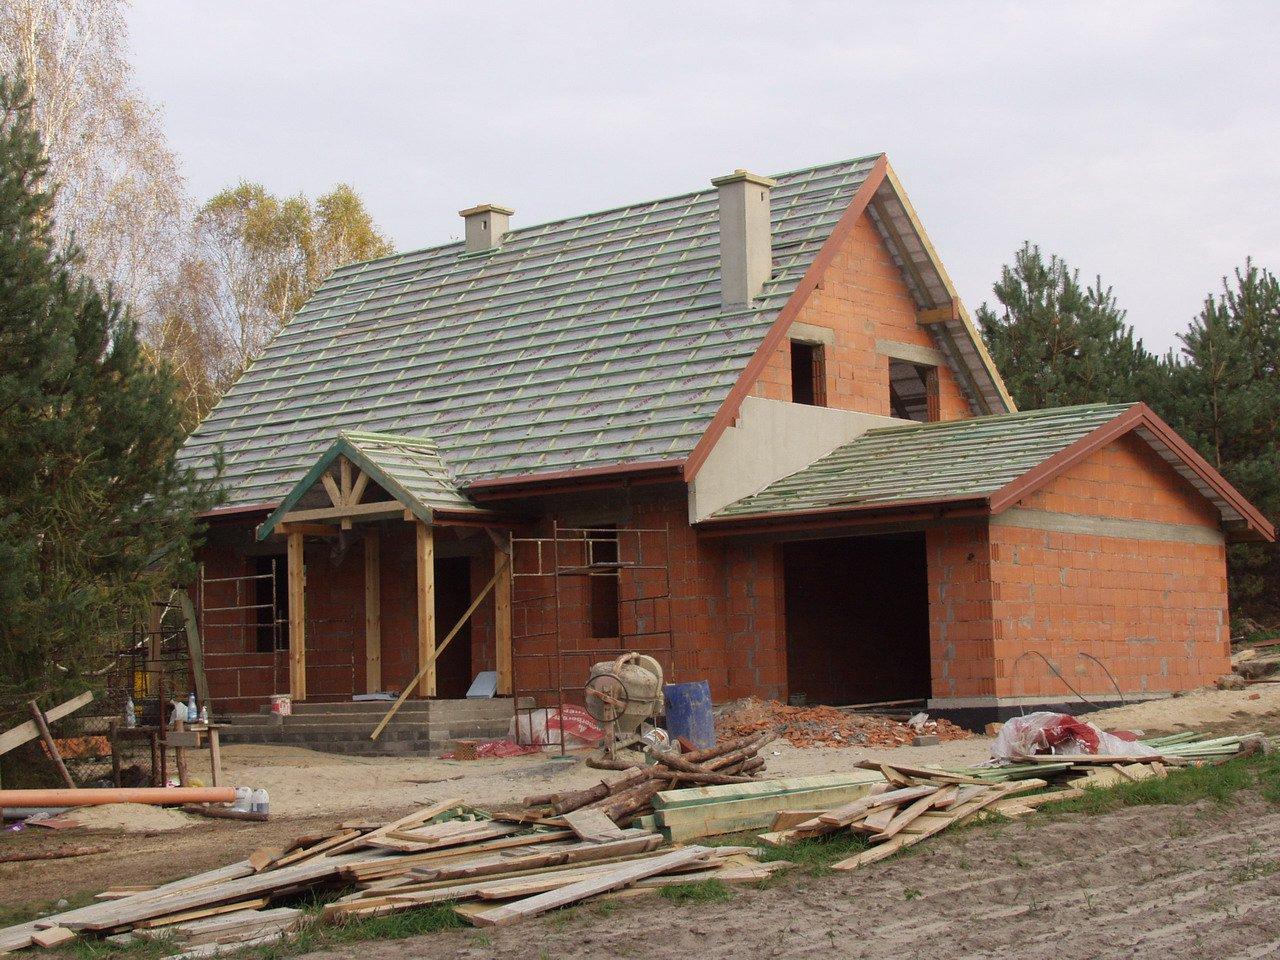 projekt-domu-lesny-zakatek-fot-7-1390379640-gix8tc51.jpg